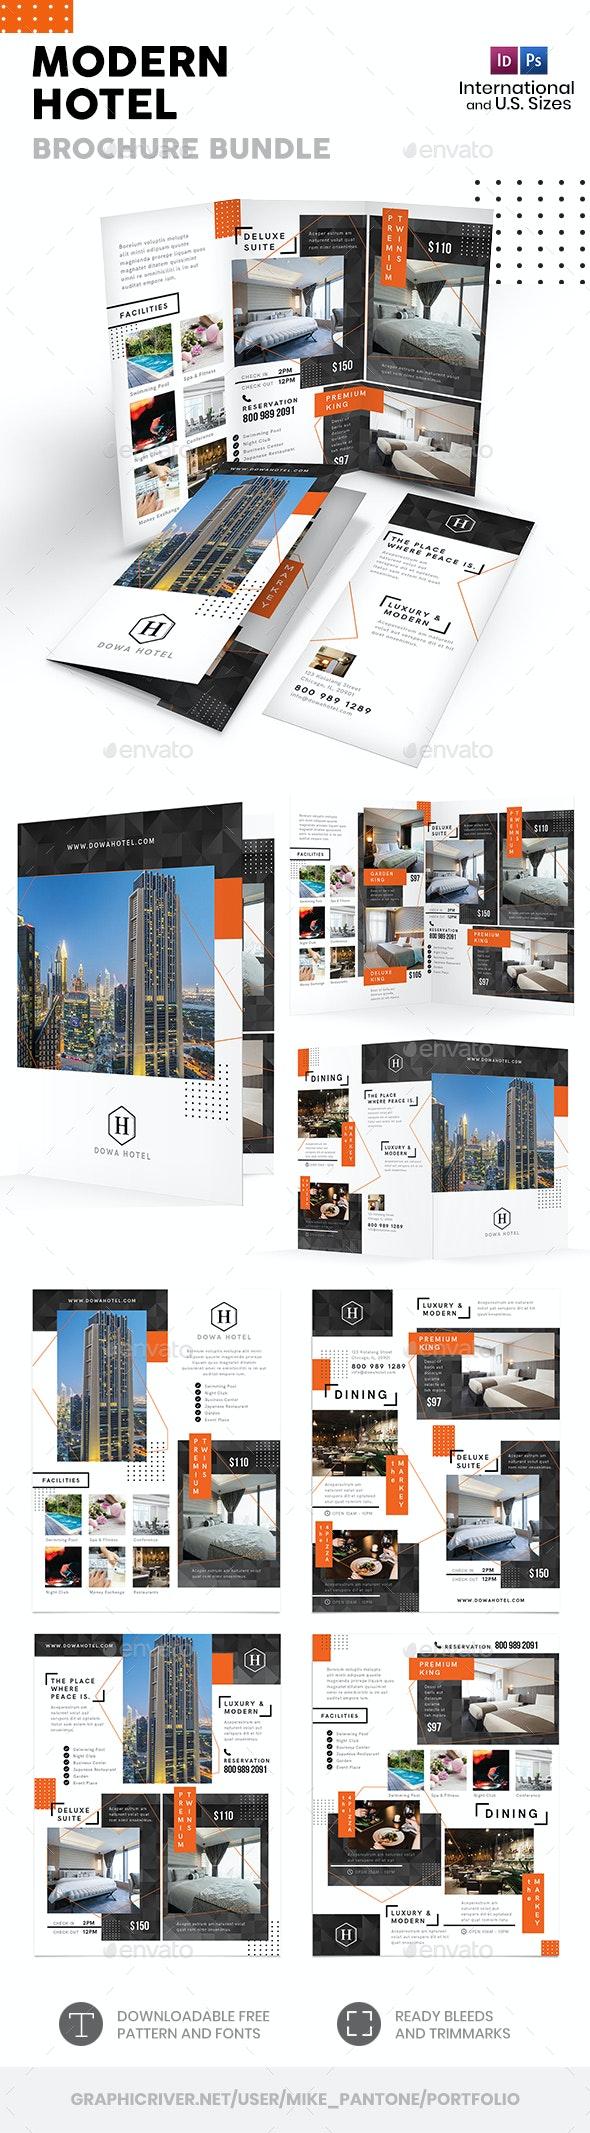 Modern Hotel Print Bundle 5 - Informational Brochures